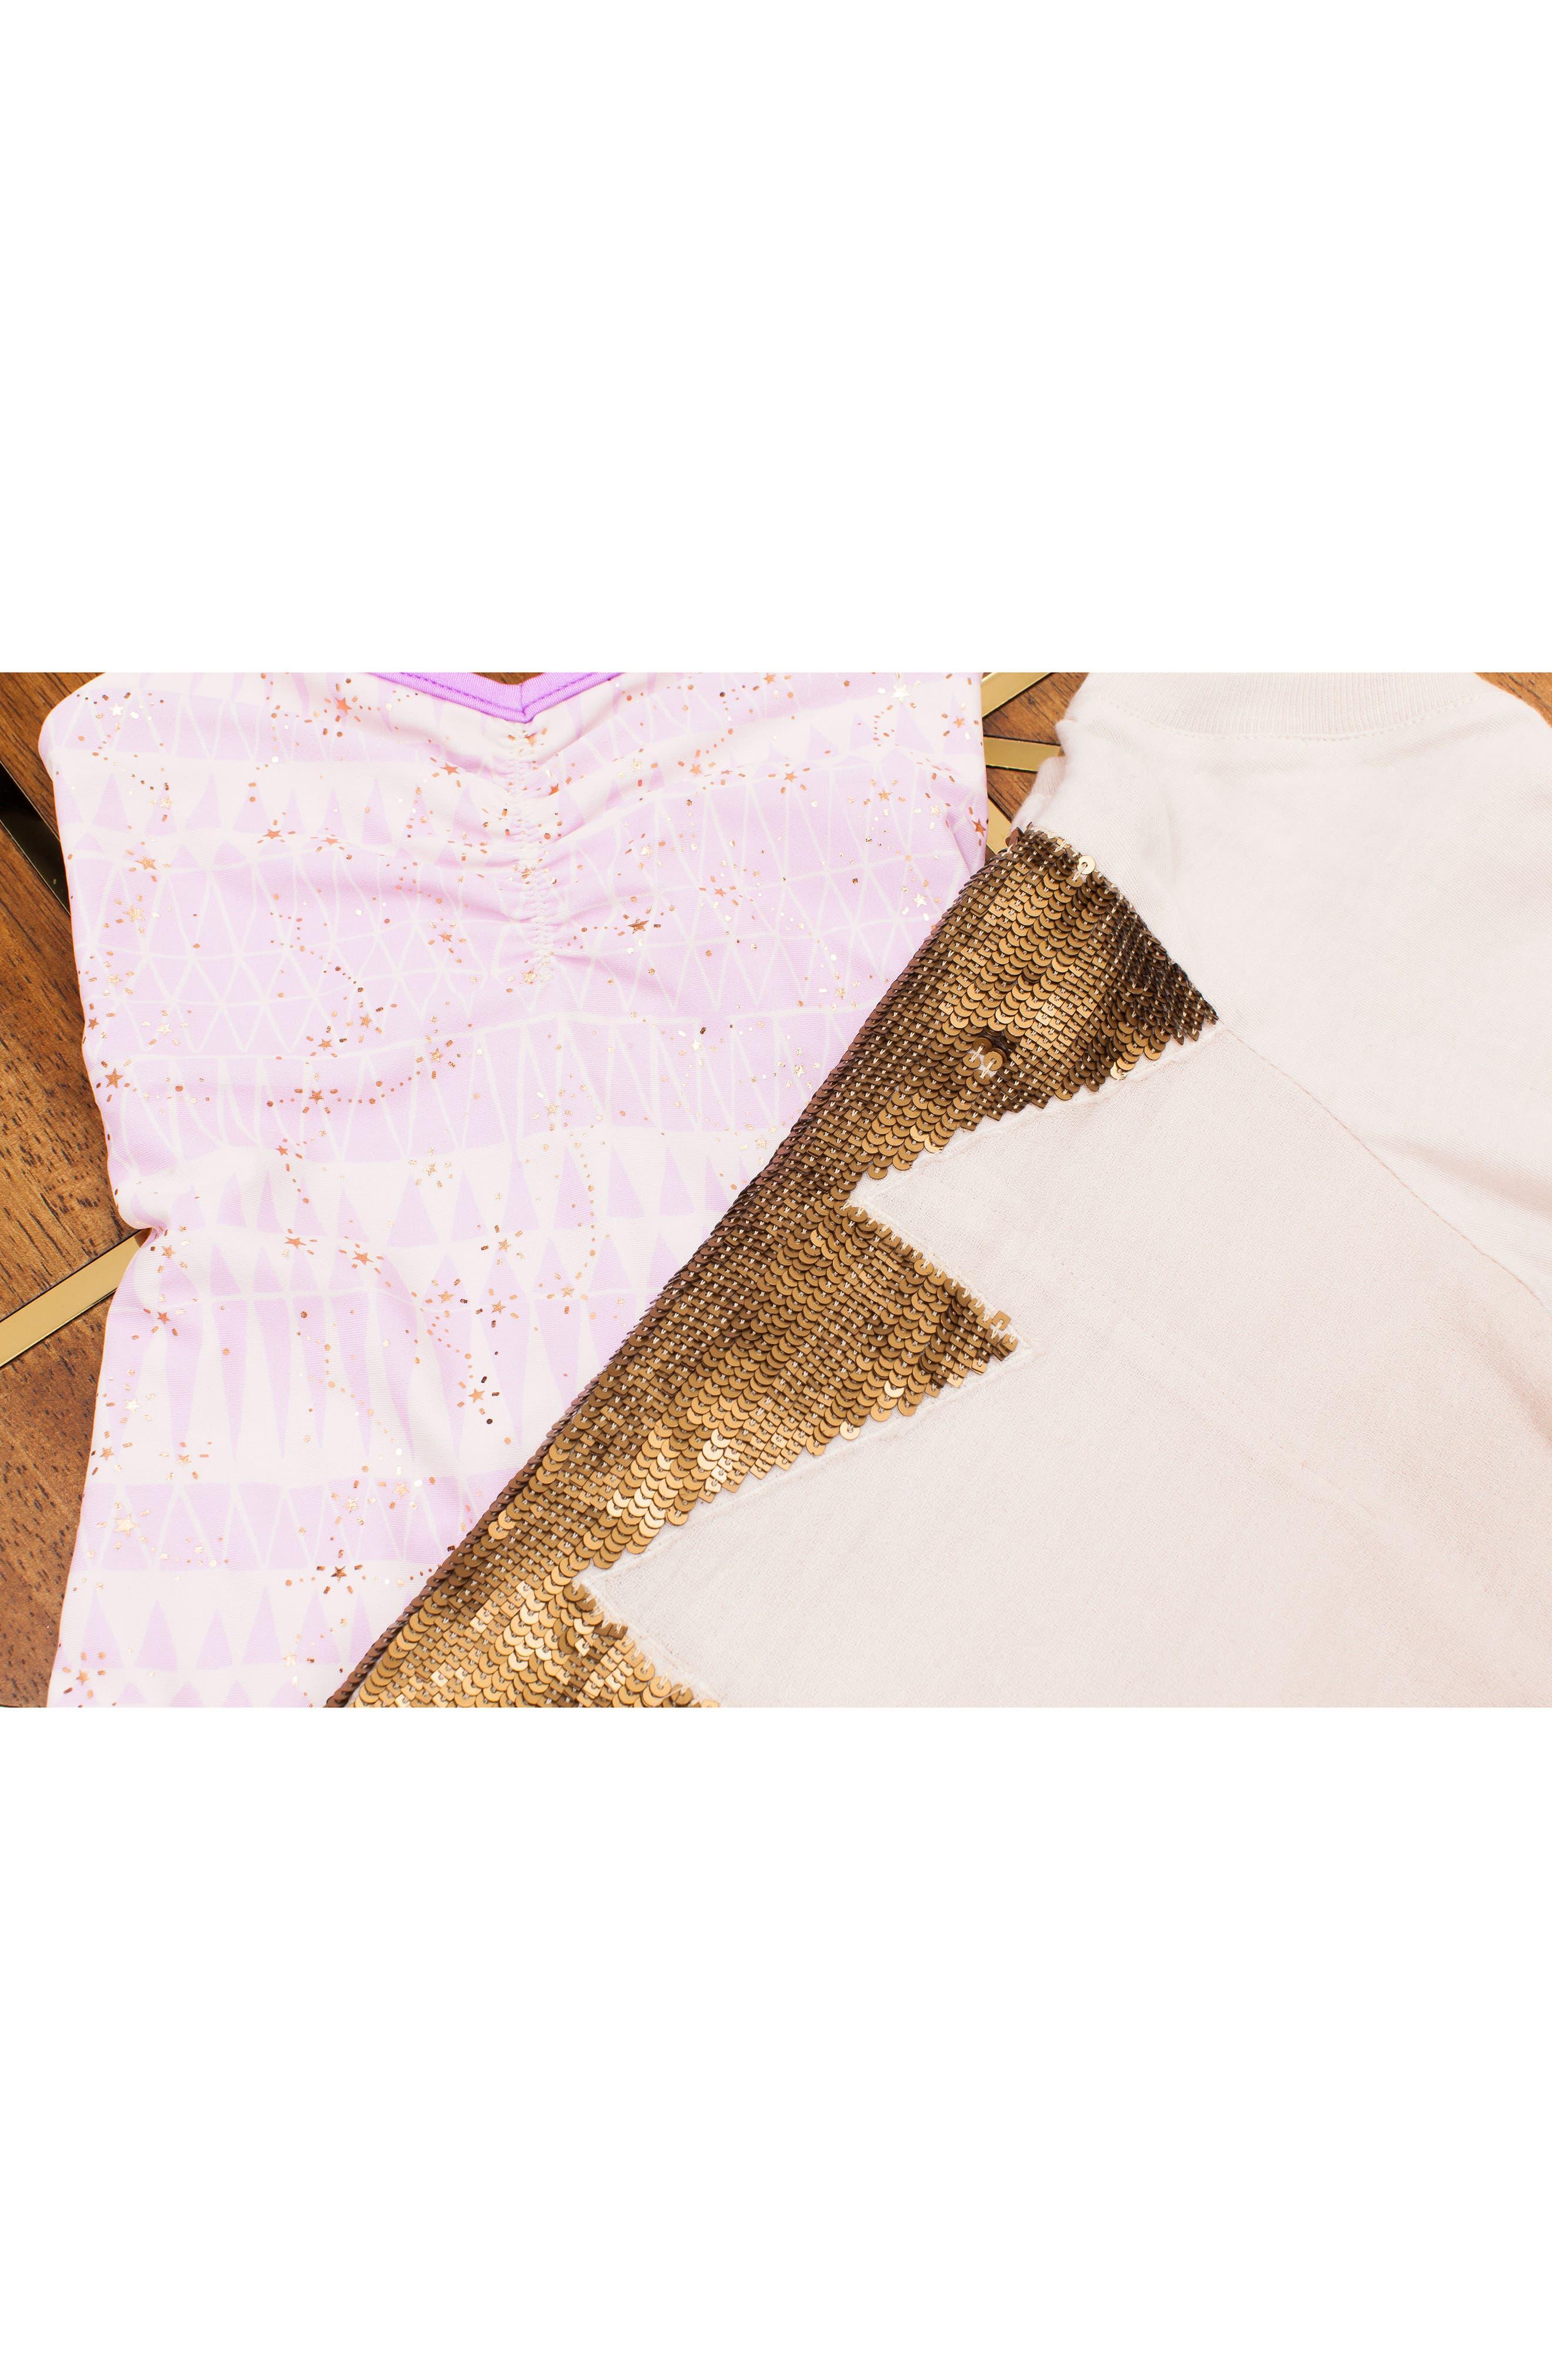 BOWIE X JAMES,                             Catalinakini One-Piece Reversible Swimsuit,                             Alternate thumbnail 5, color,                             LAVENDER